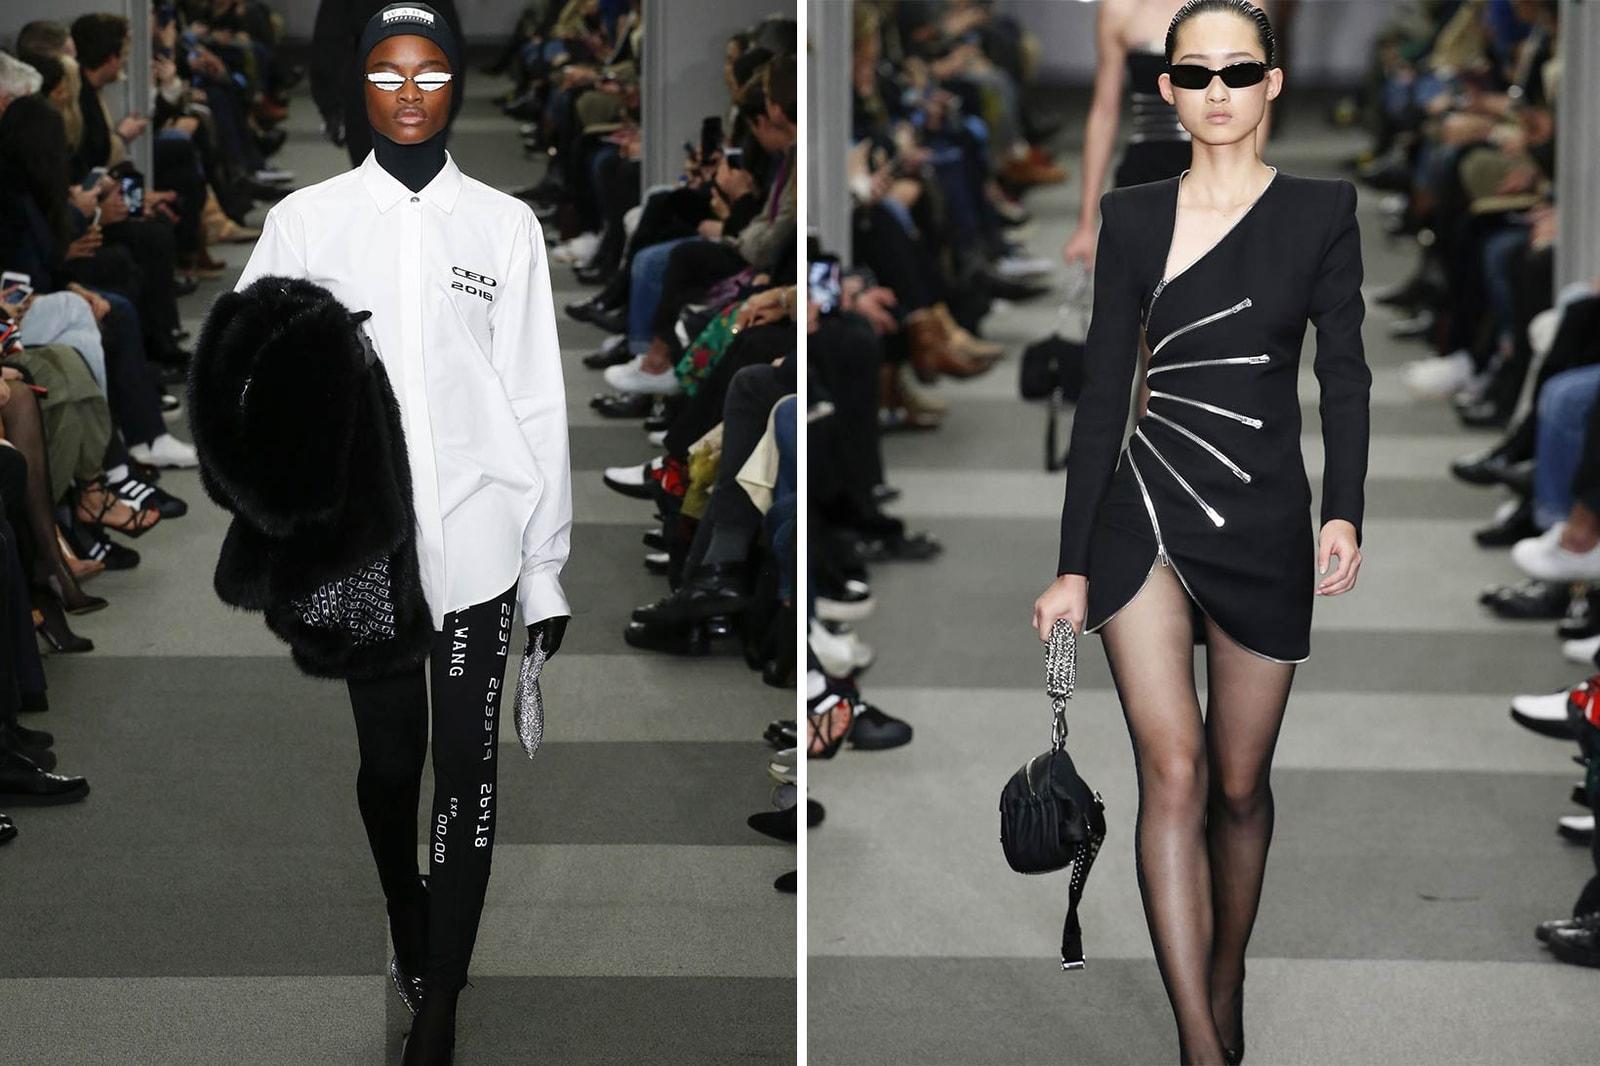 Kaia Gerber Coach 1941 Fall Winter 2018 New York Fashion Week Streetsnap